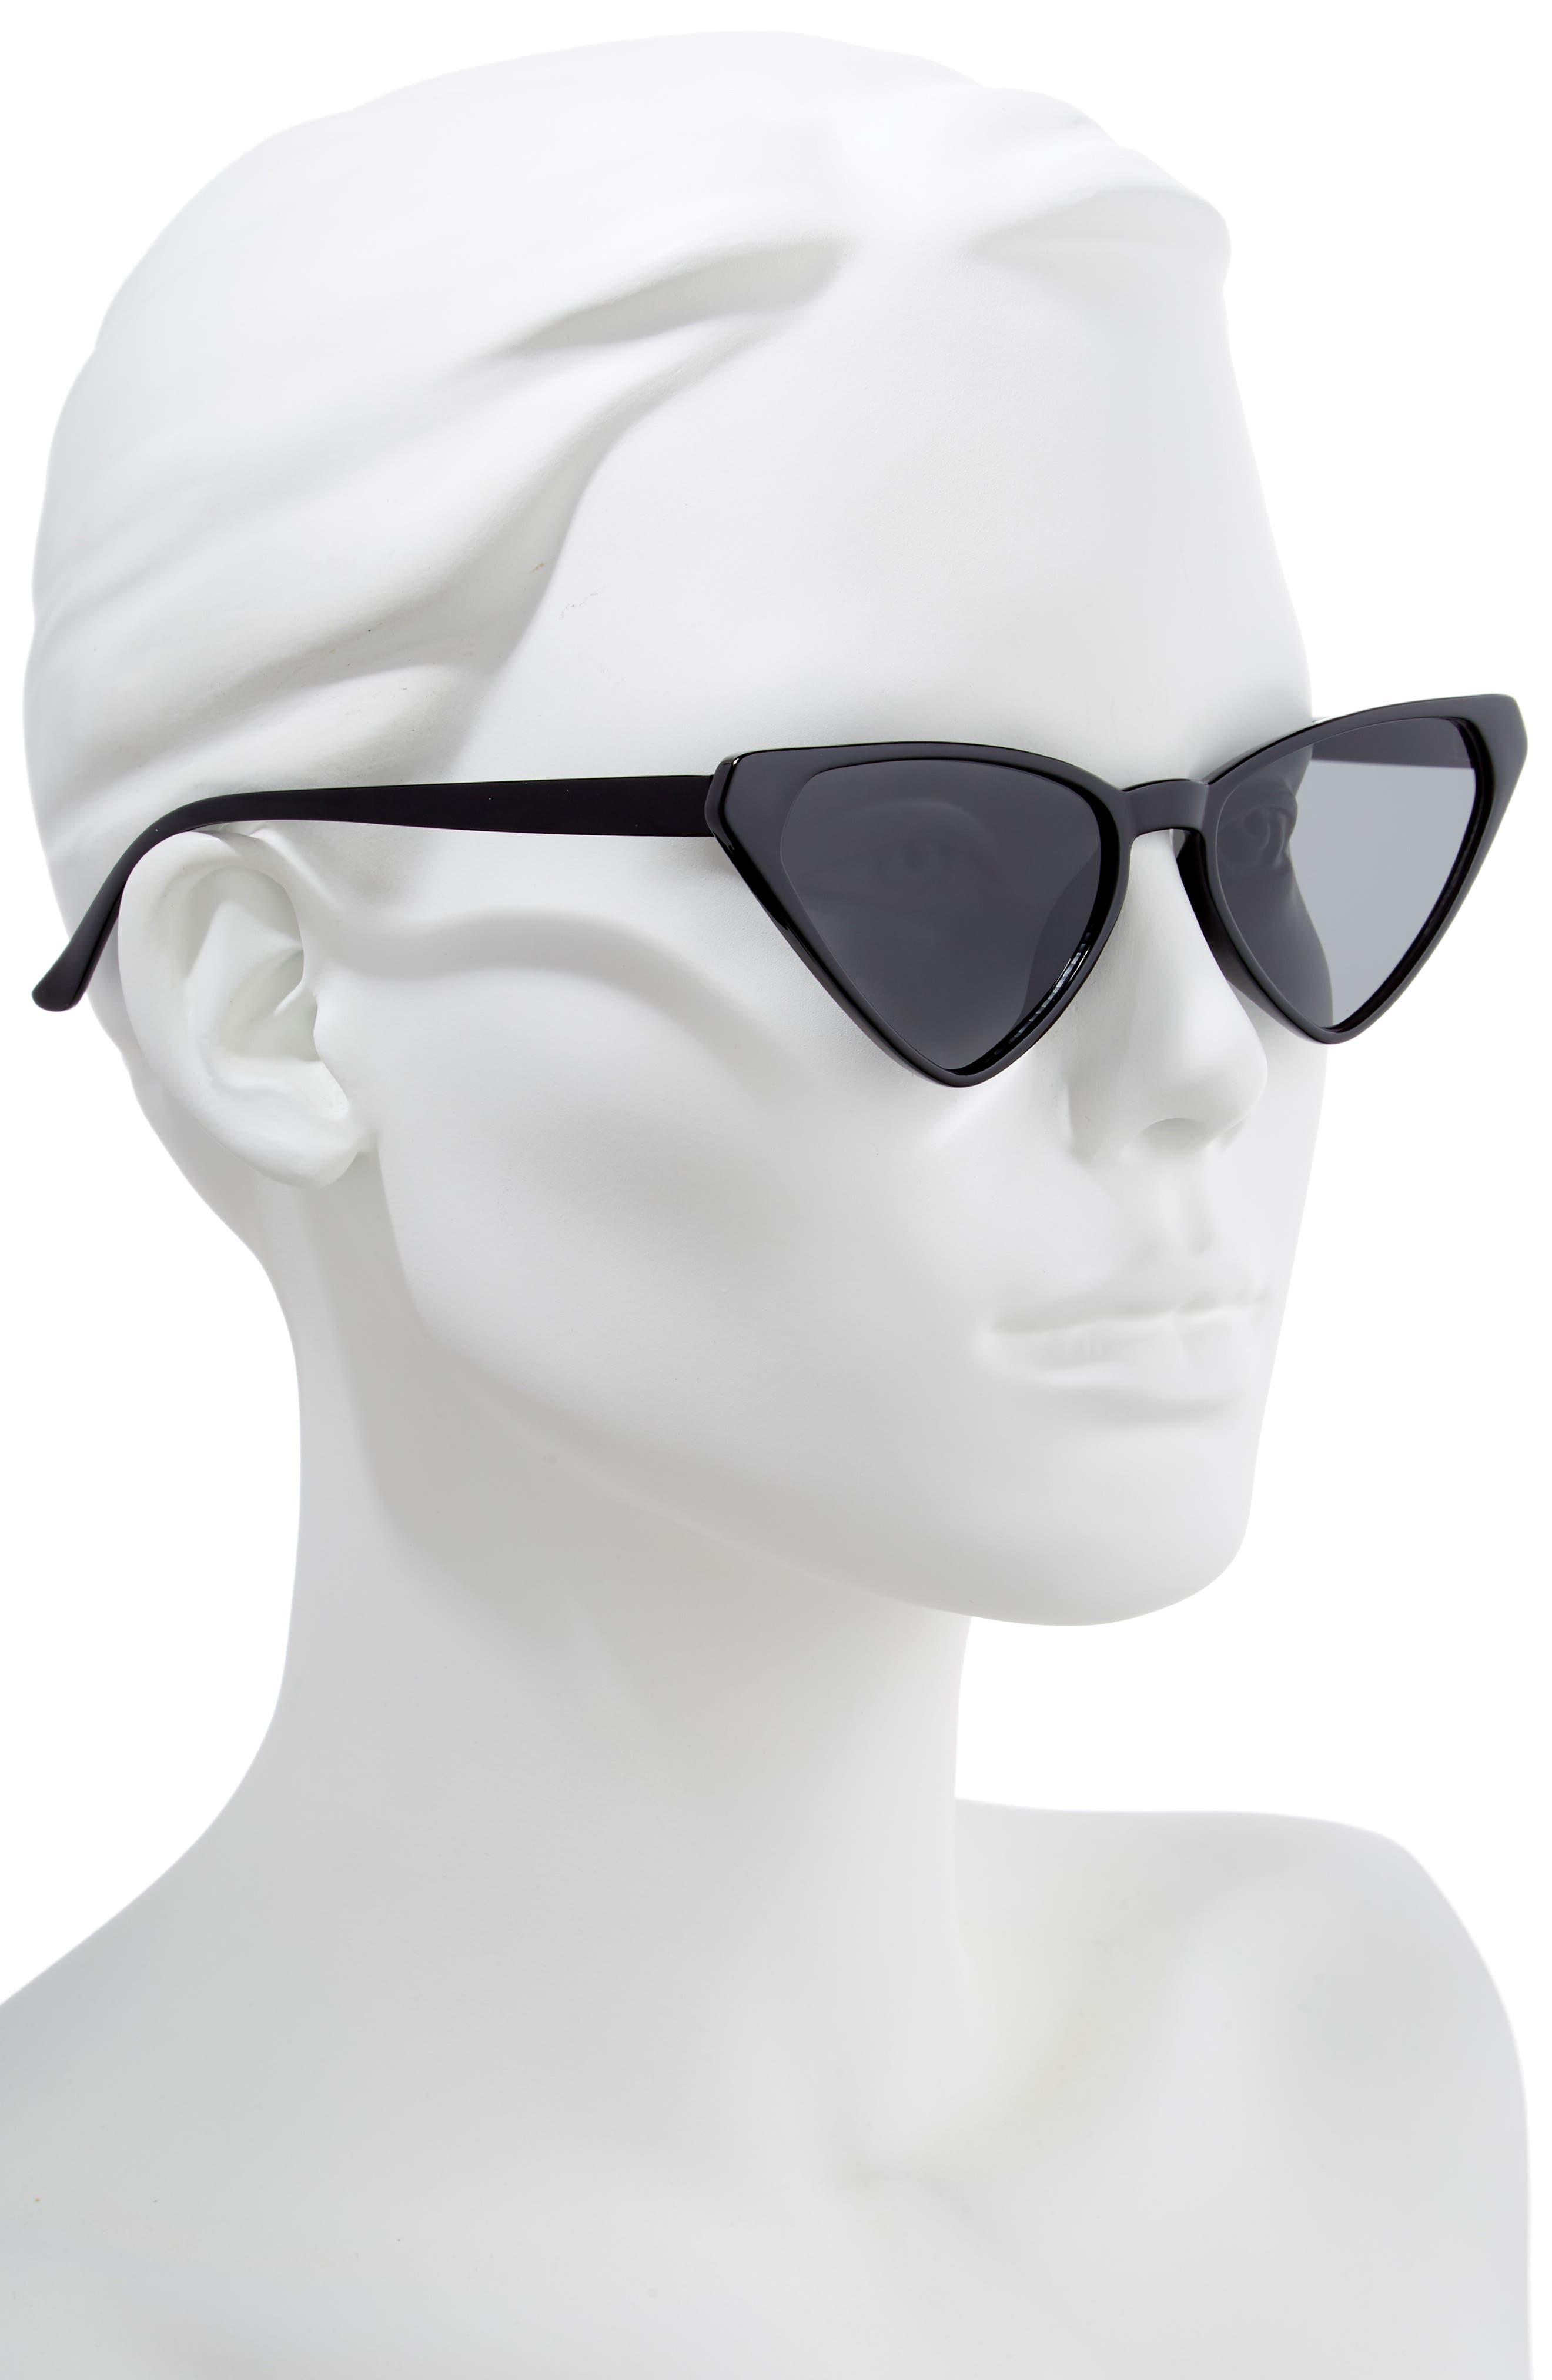 54mm Angular Cat Eye Sunglasses,                             Alternate thumbnail 2, color,                             BLACK